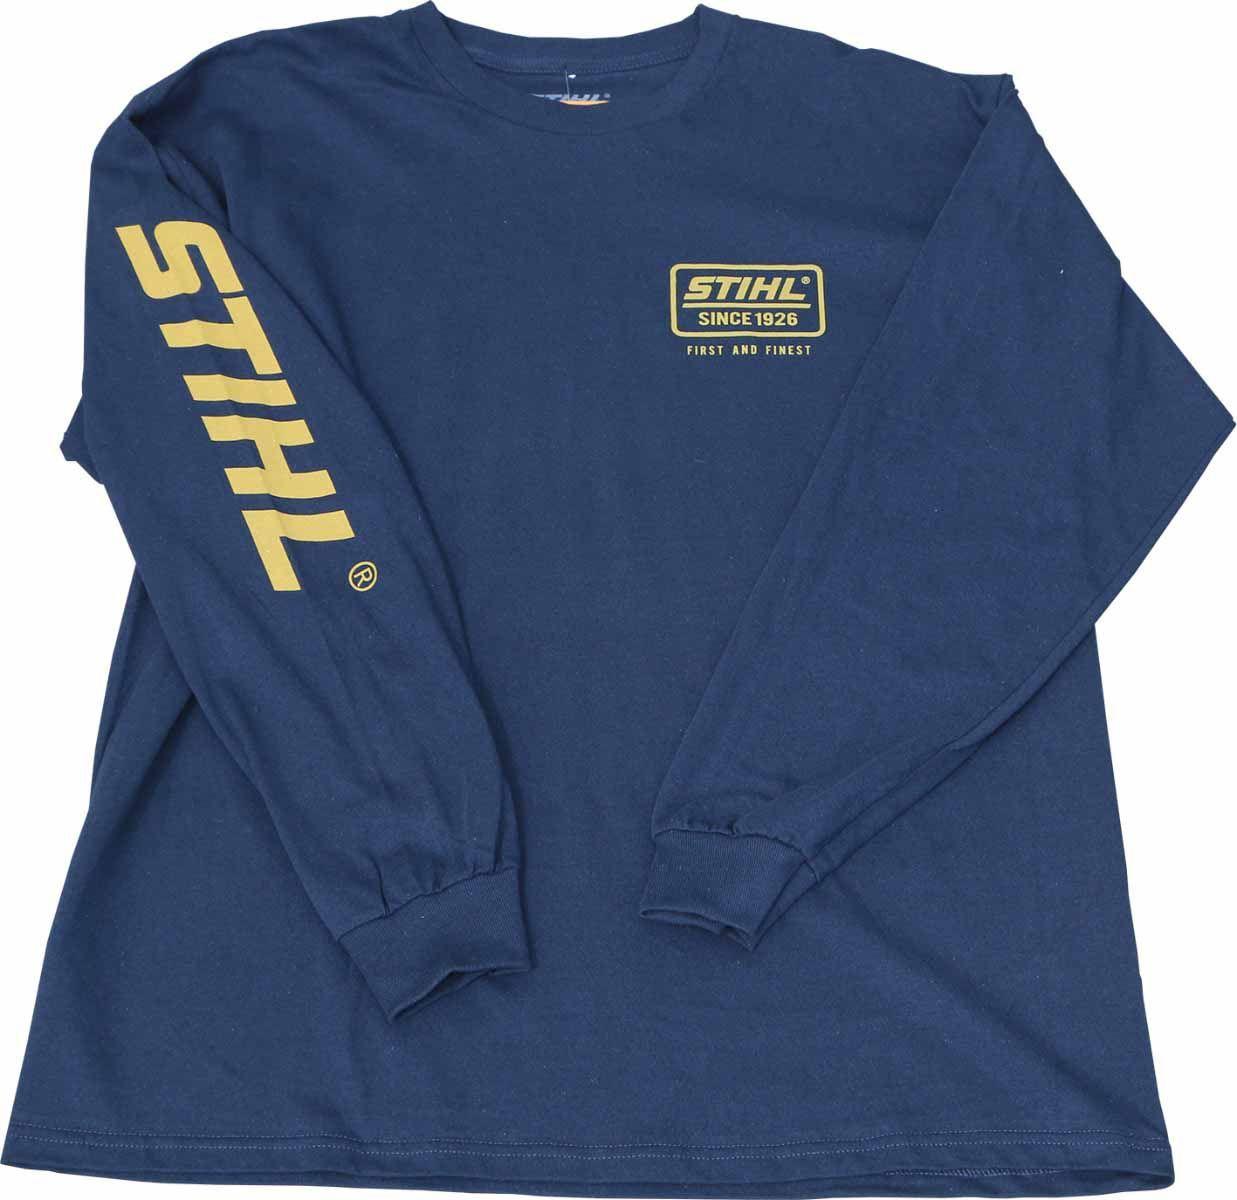 STIHL Since 1926 Long Sleeve Shirt